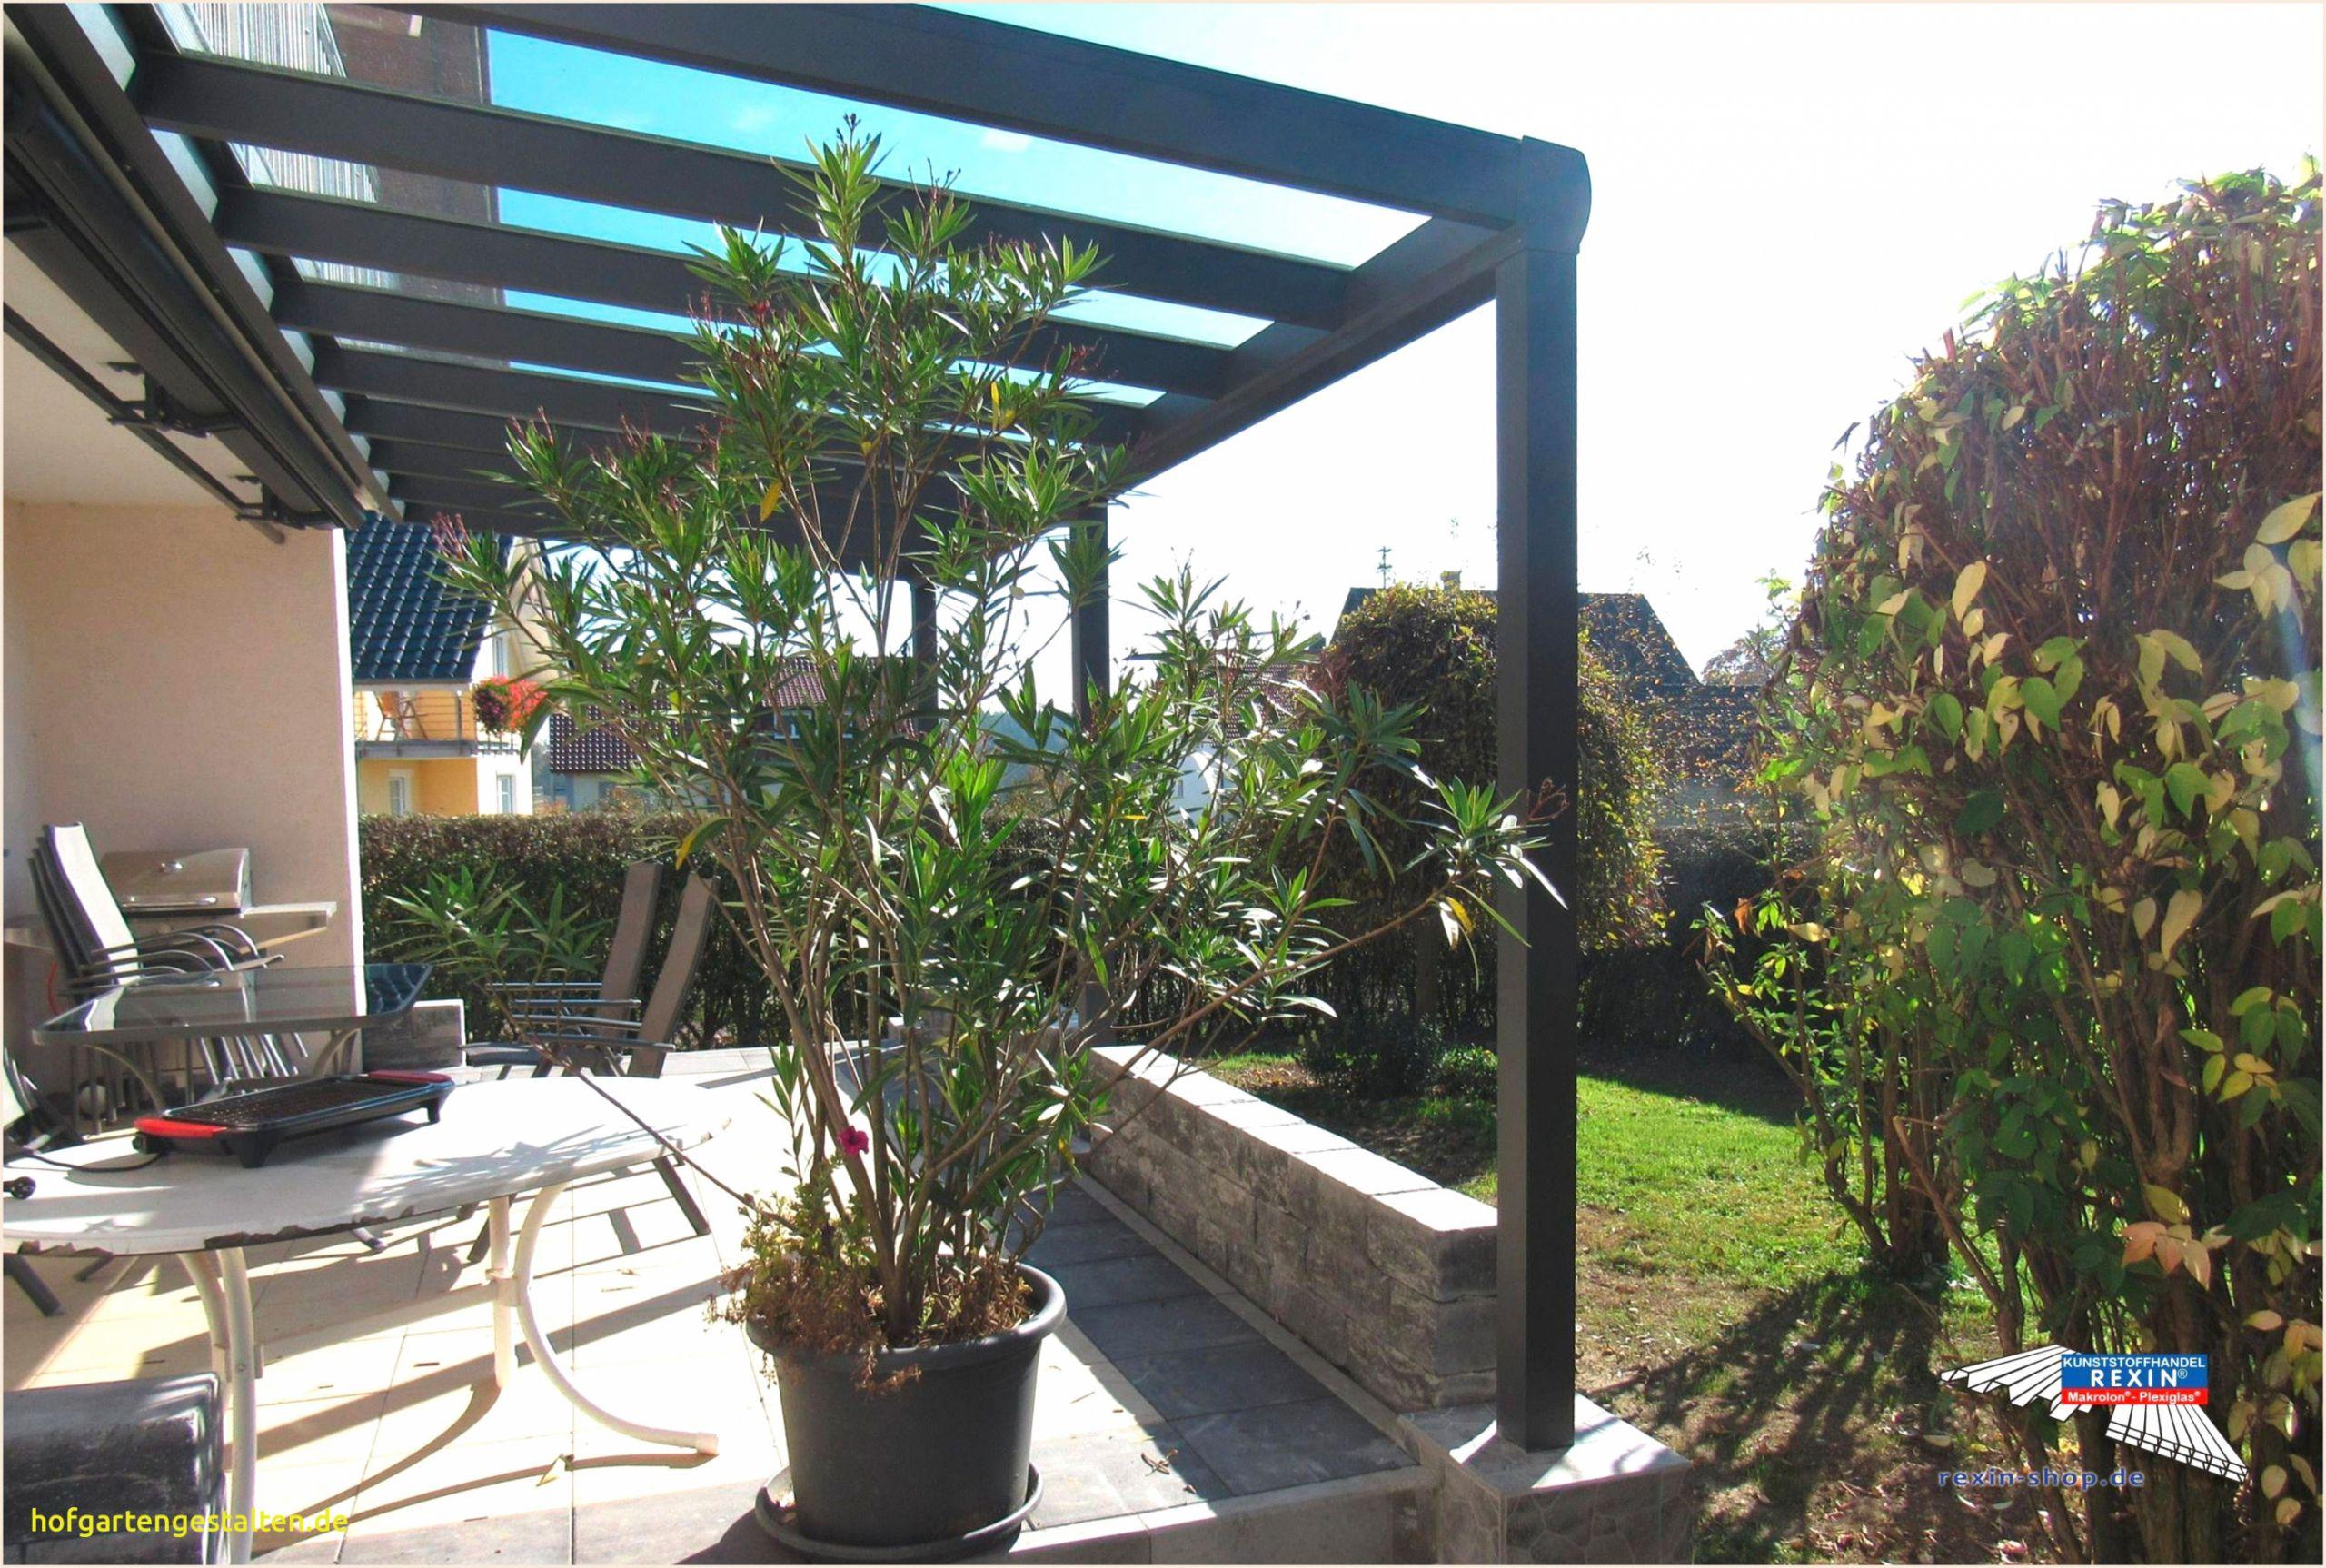 Balkon Deko Selber Machen Schön Garten Deko Ideen Selbermachen — Temobardz Home Blog